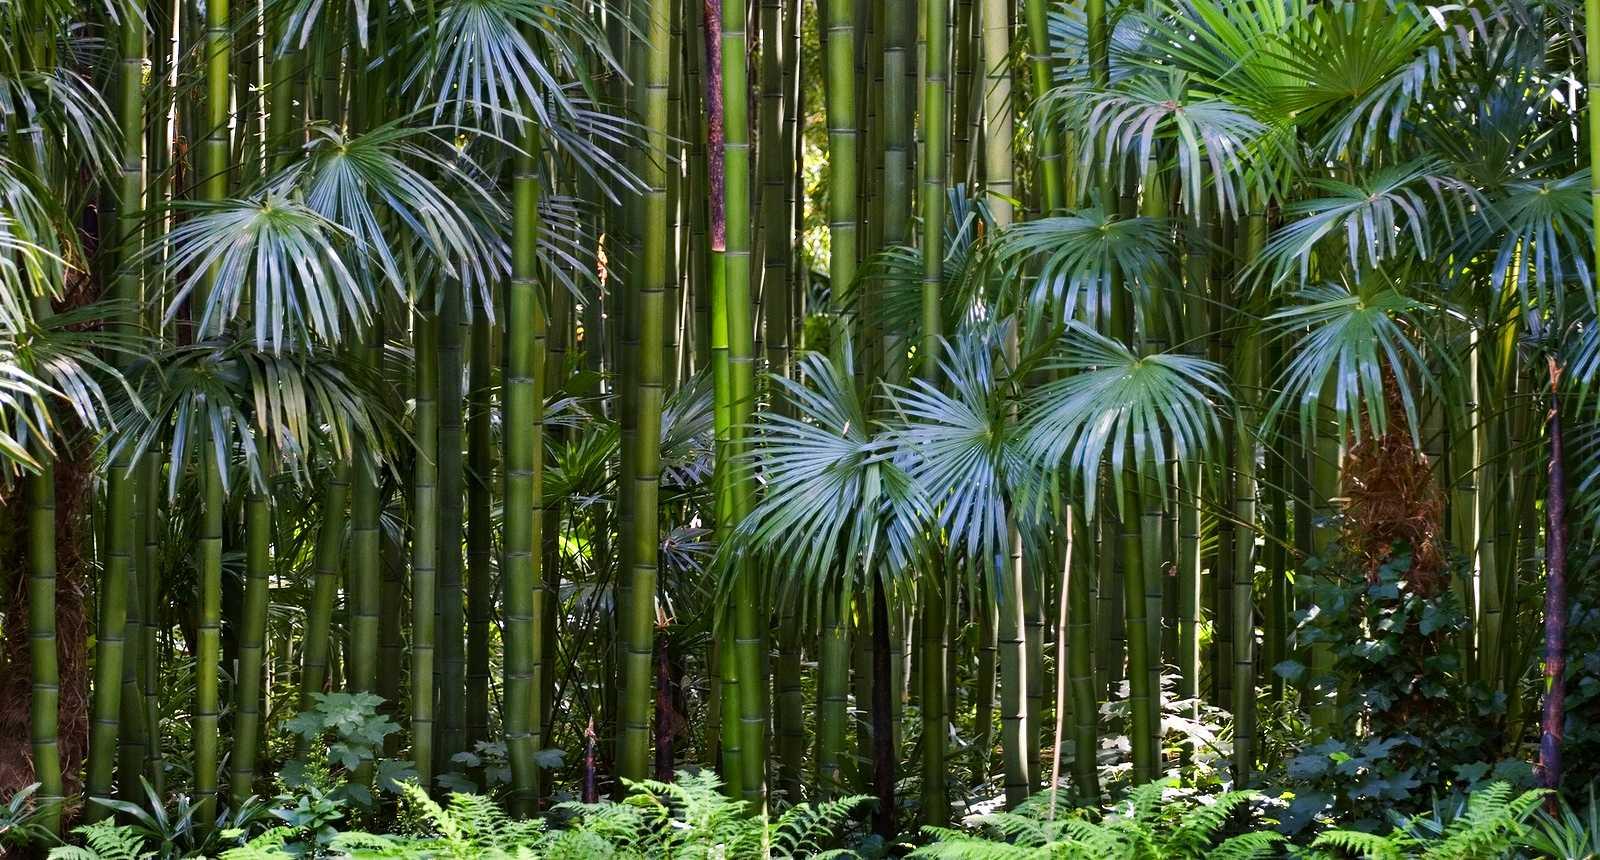 Image : Bambouseraie de Prafrance